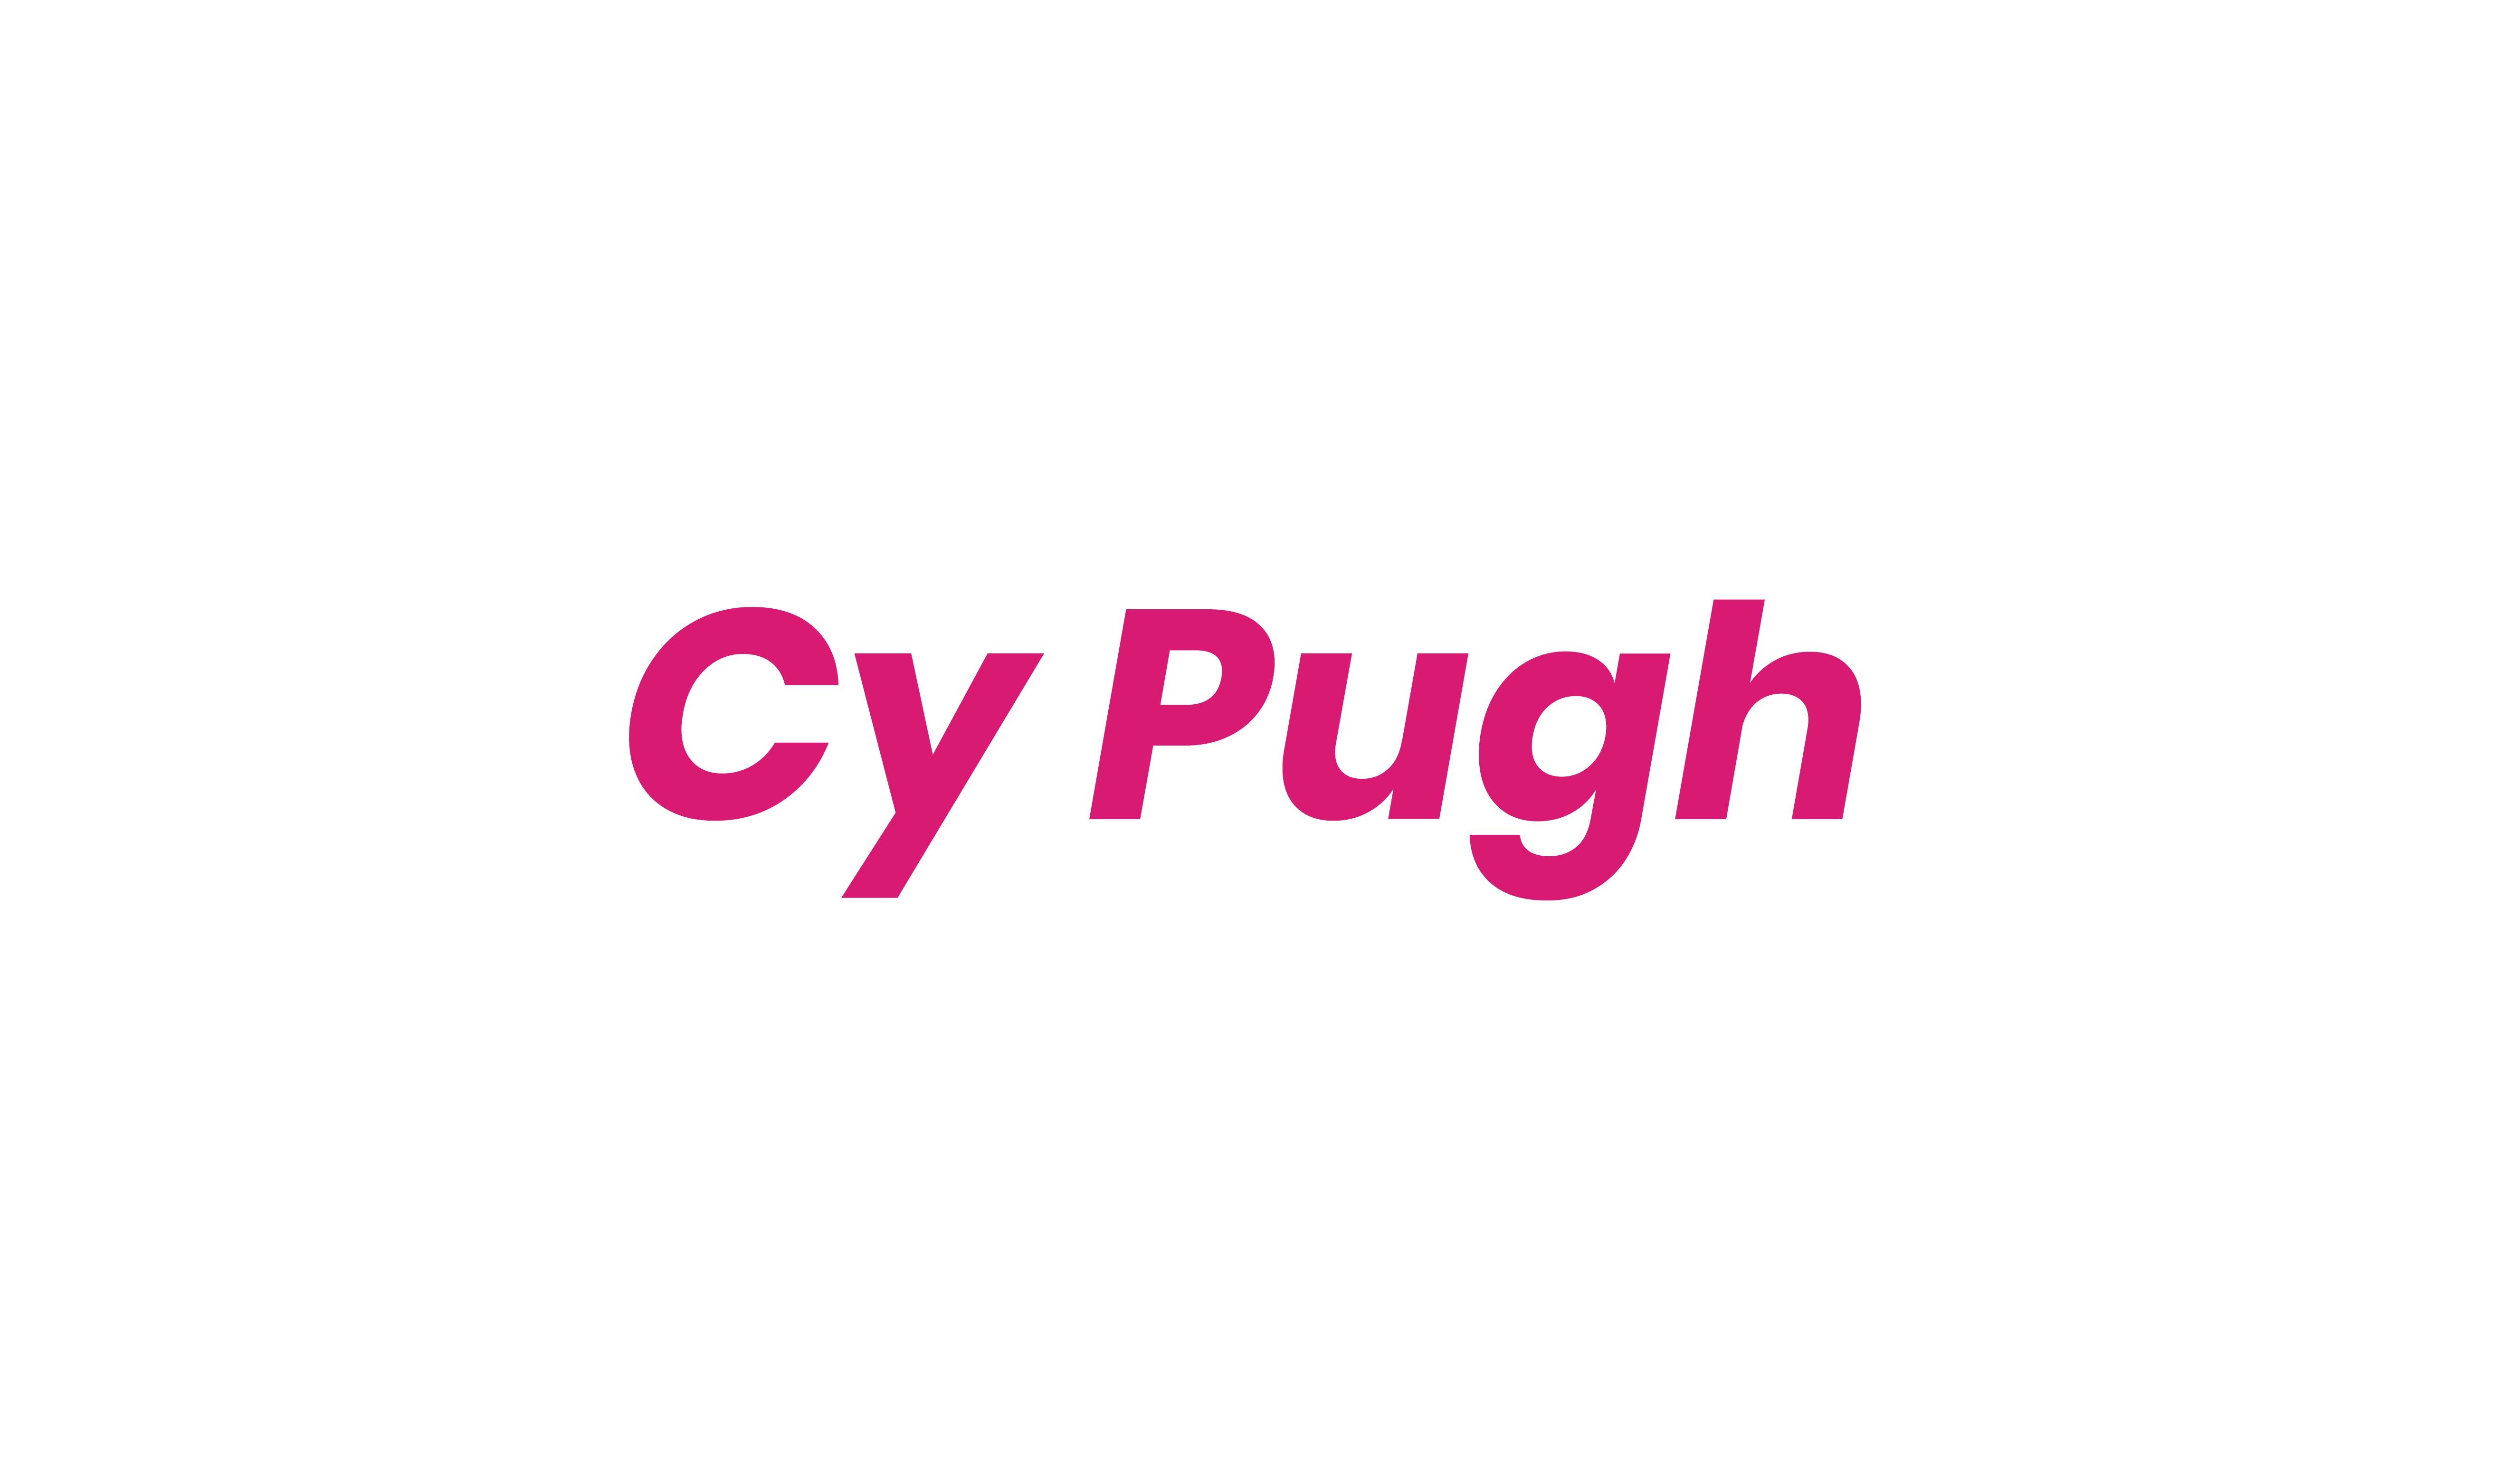 Cy Pugh